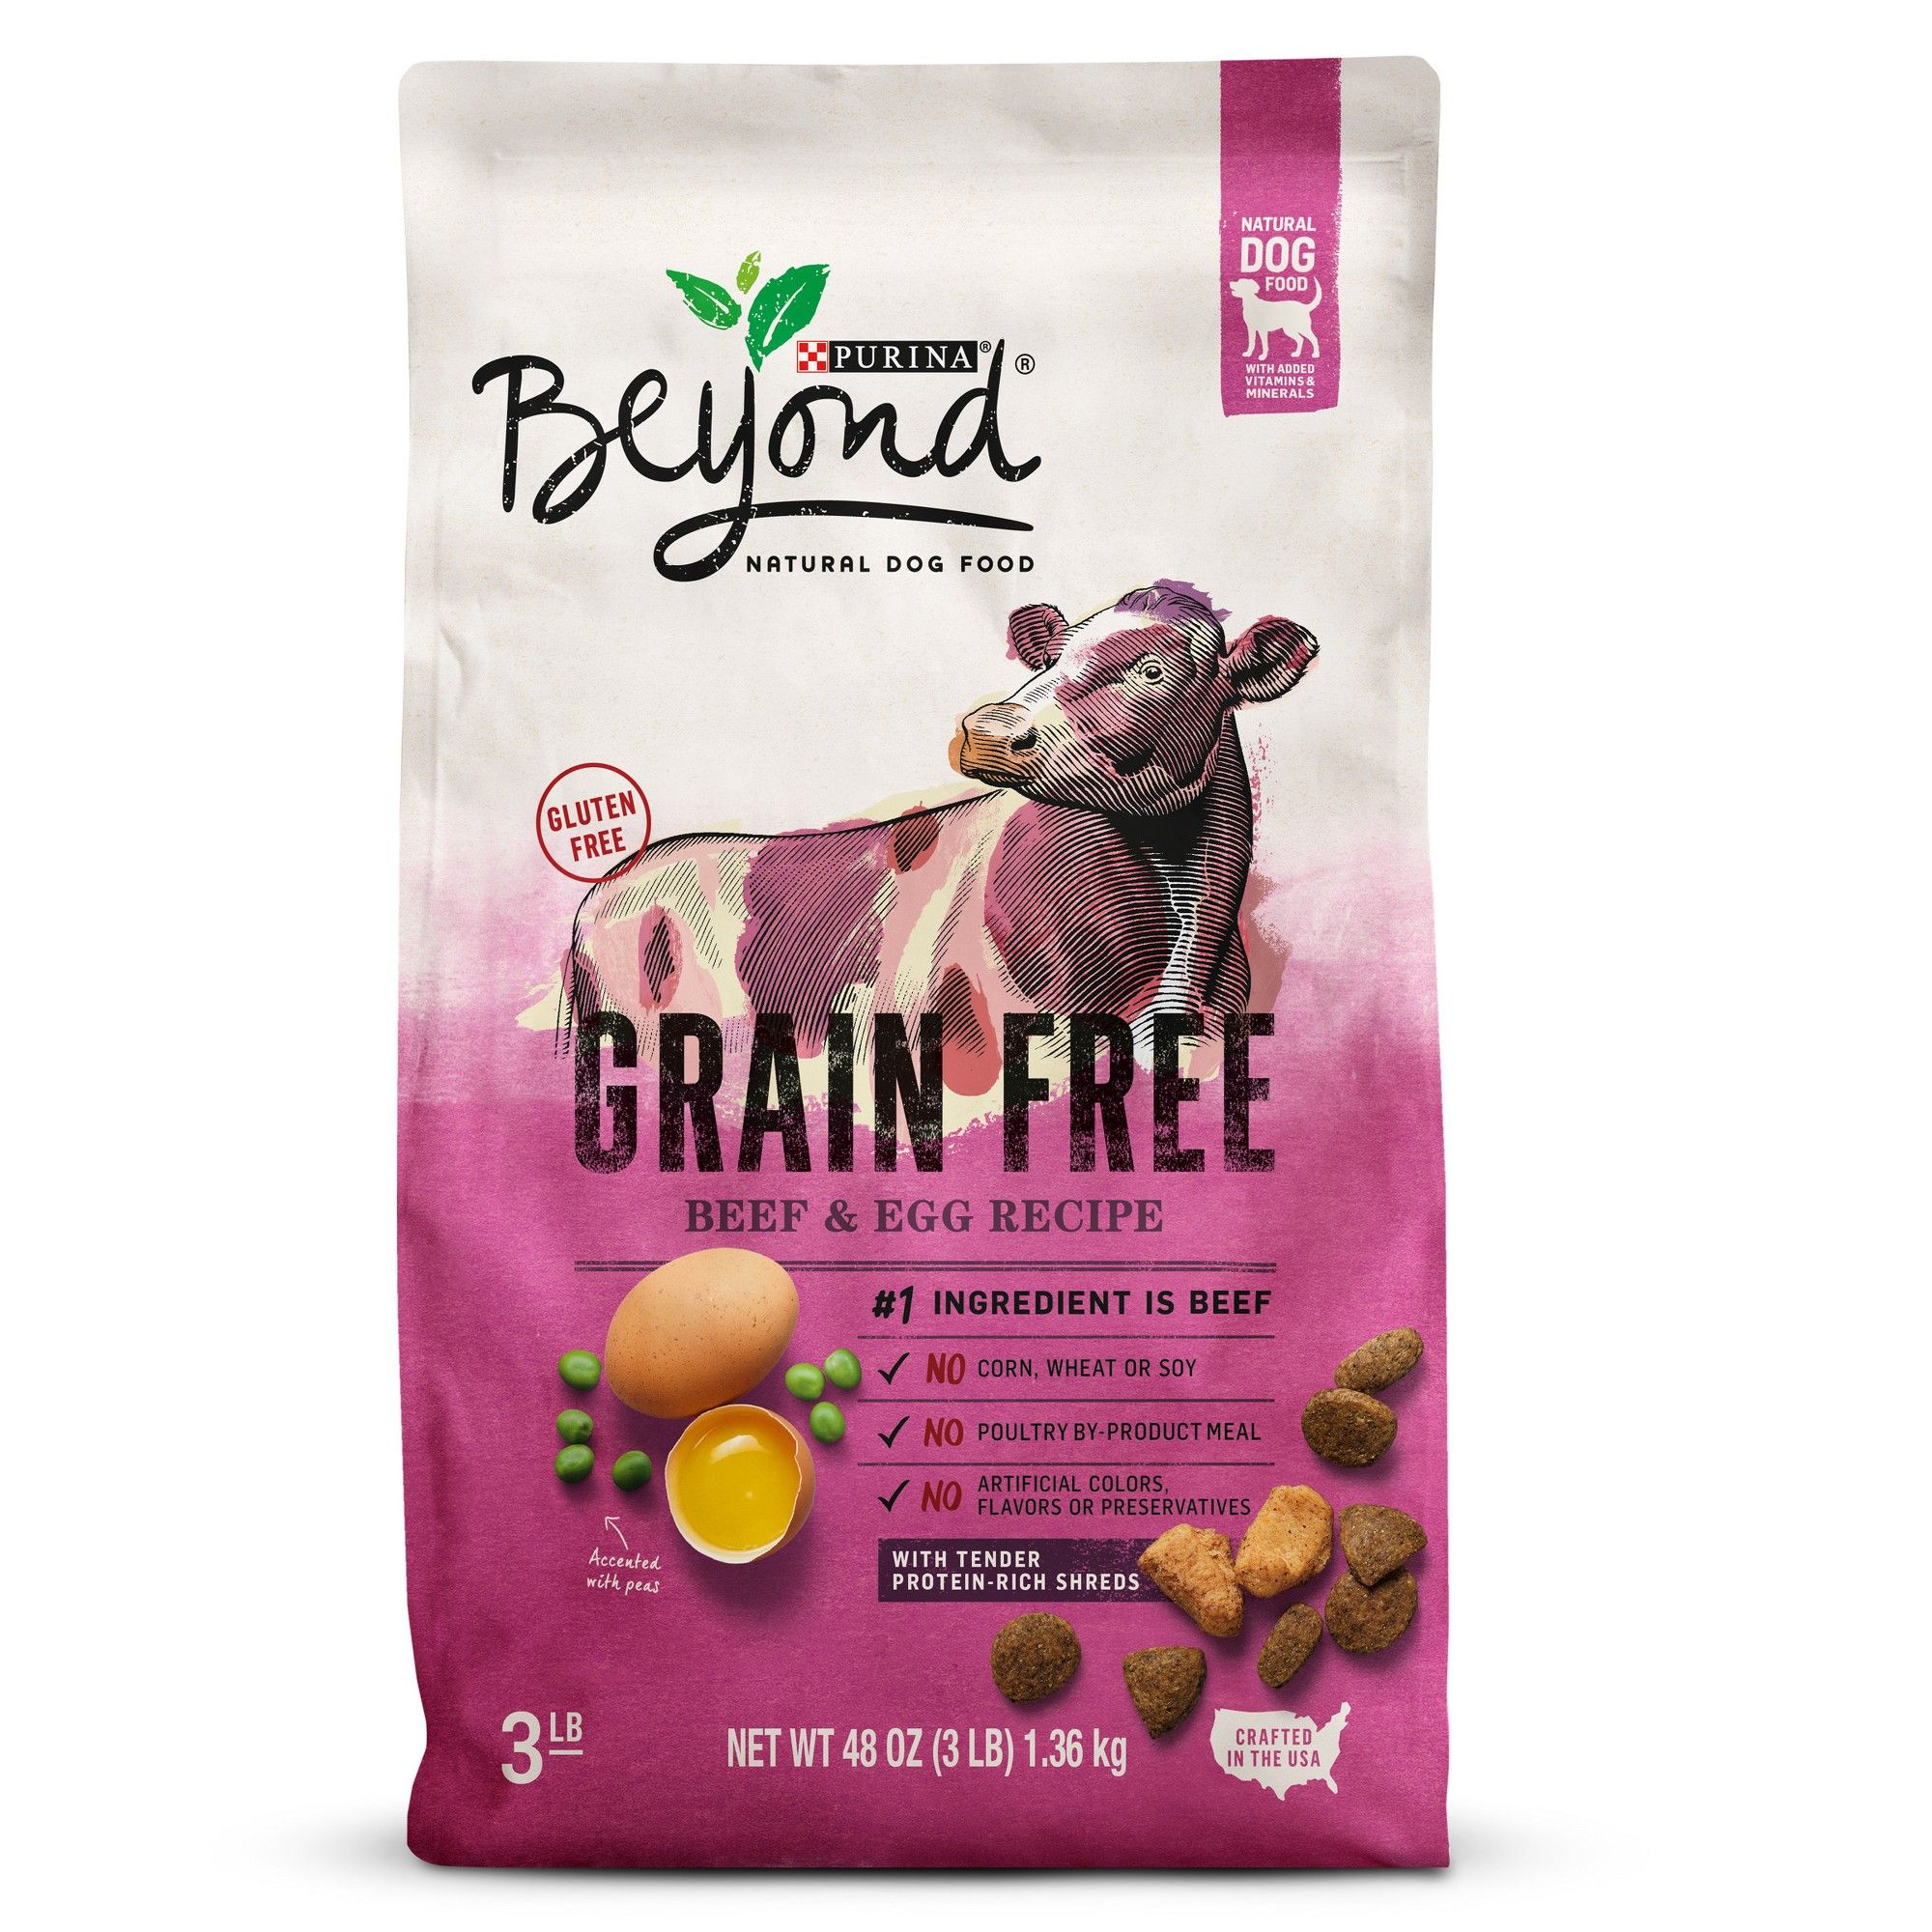 Purina Beyond Grain Free Natural Dry Dog Food Grain Free Beef